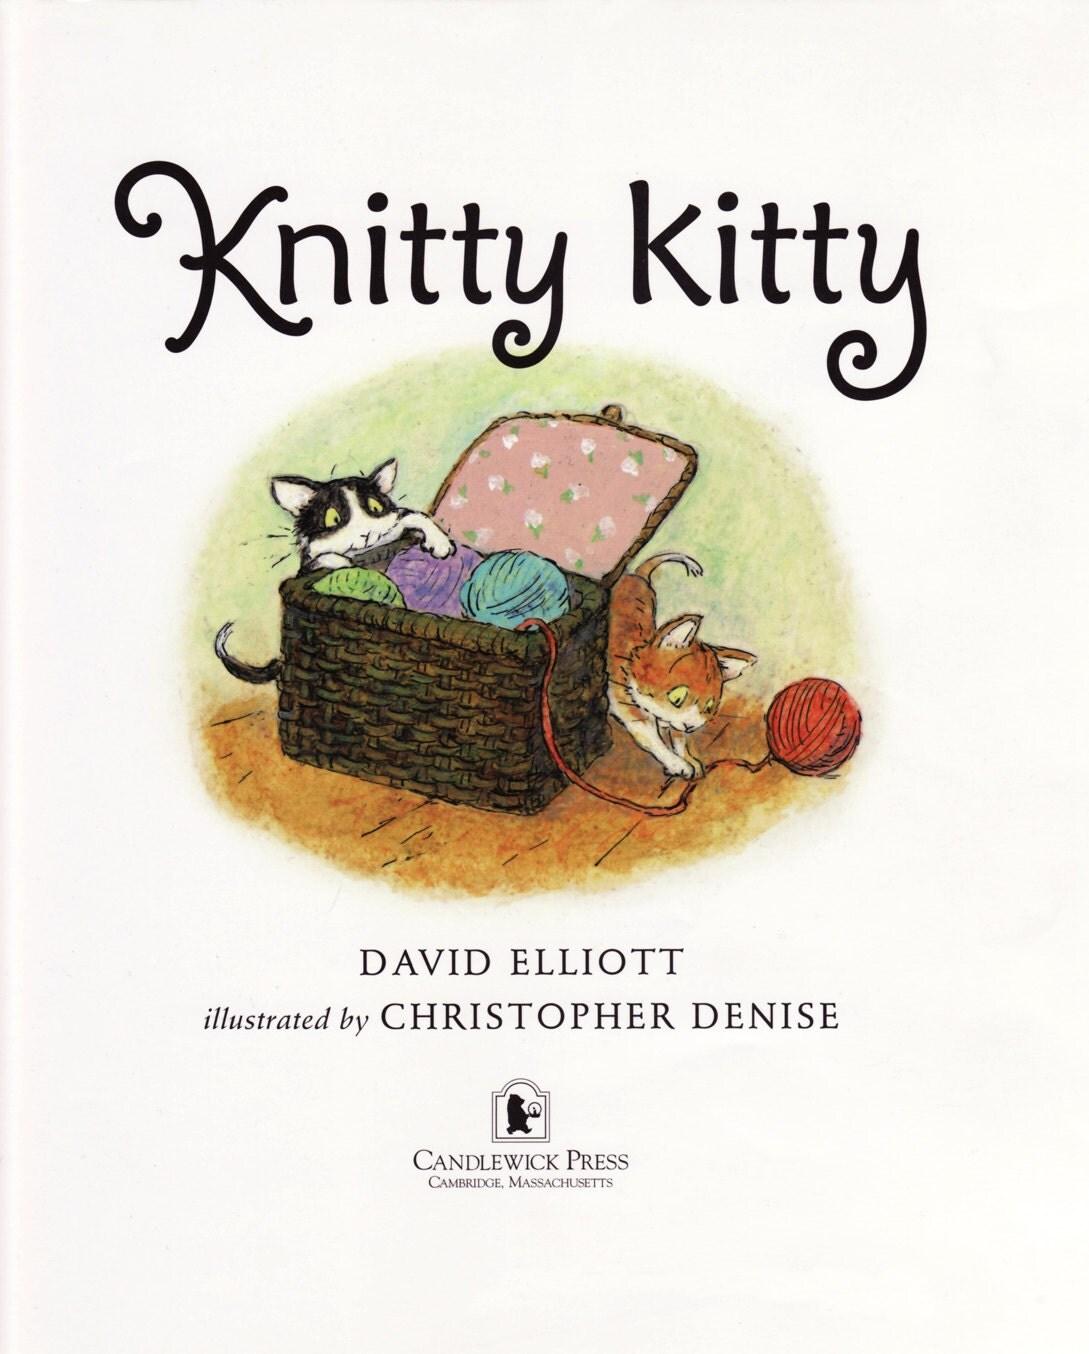 Original illustration for Knitty Kitty